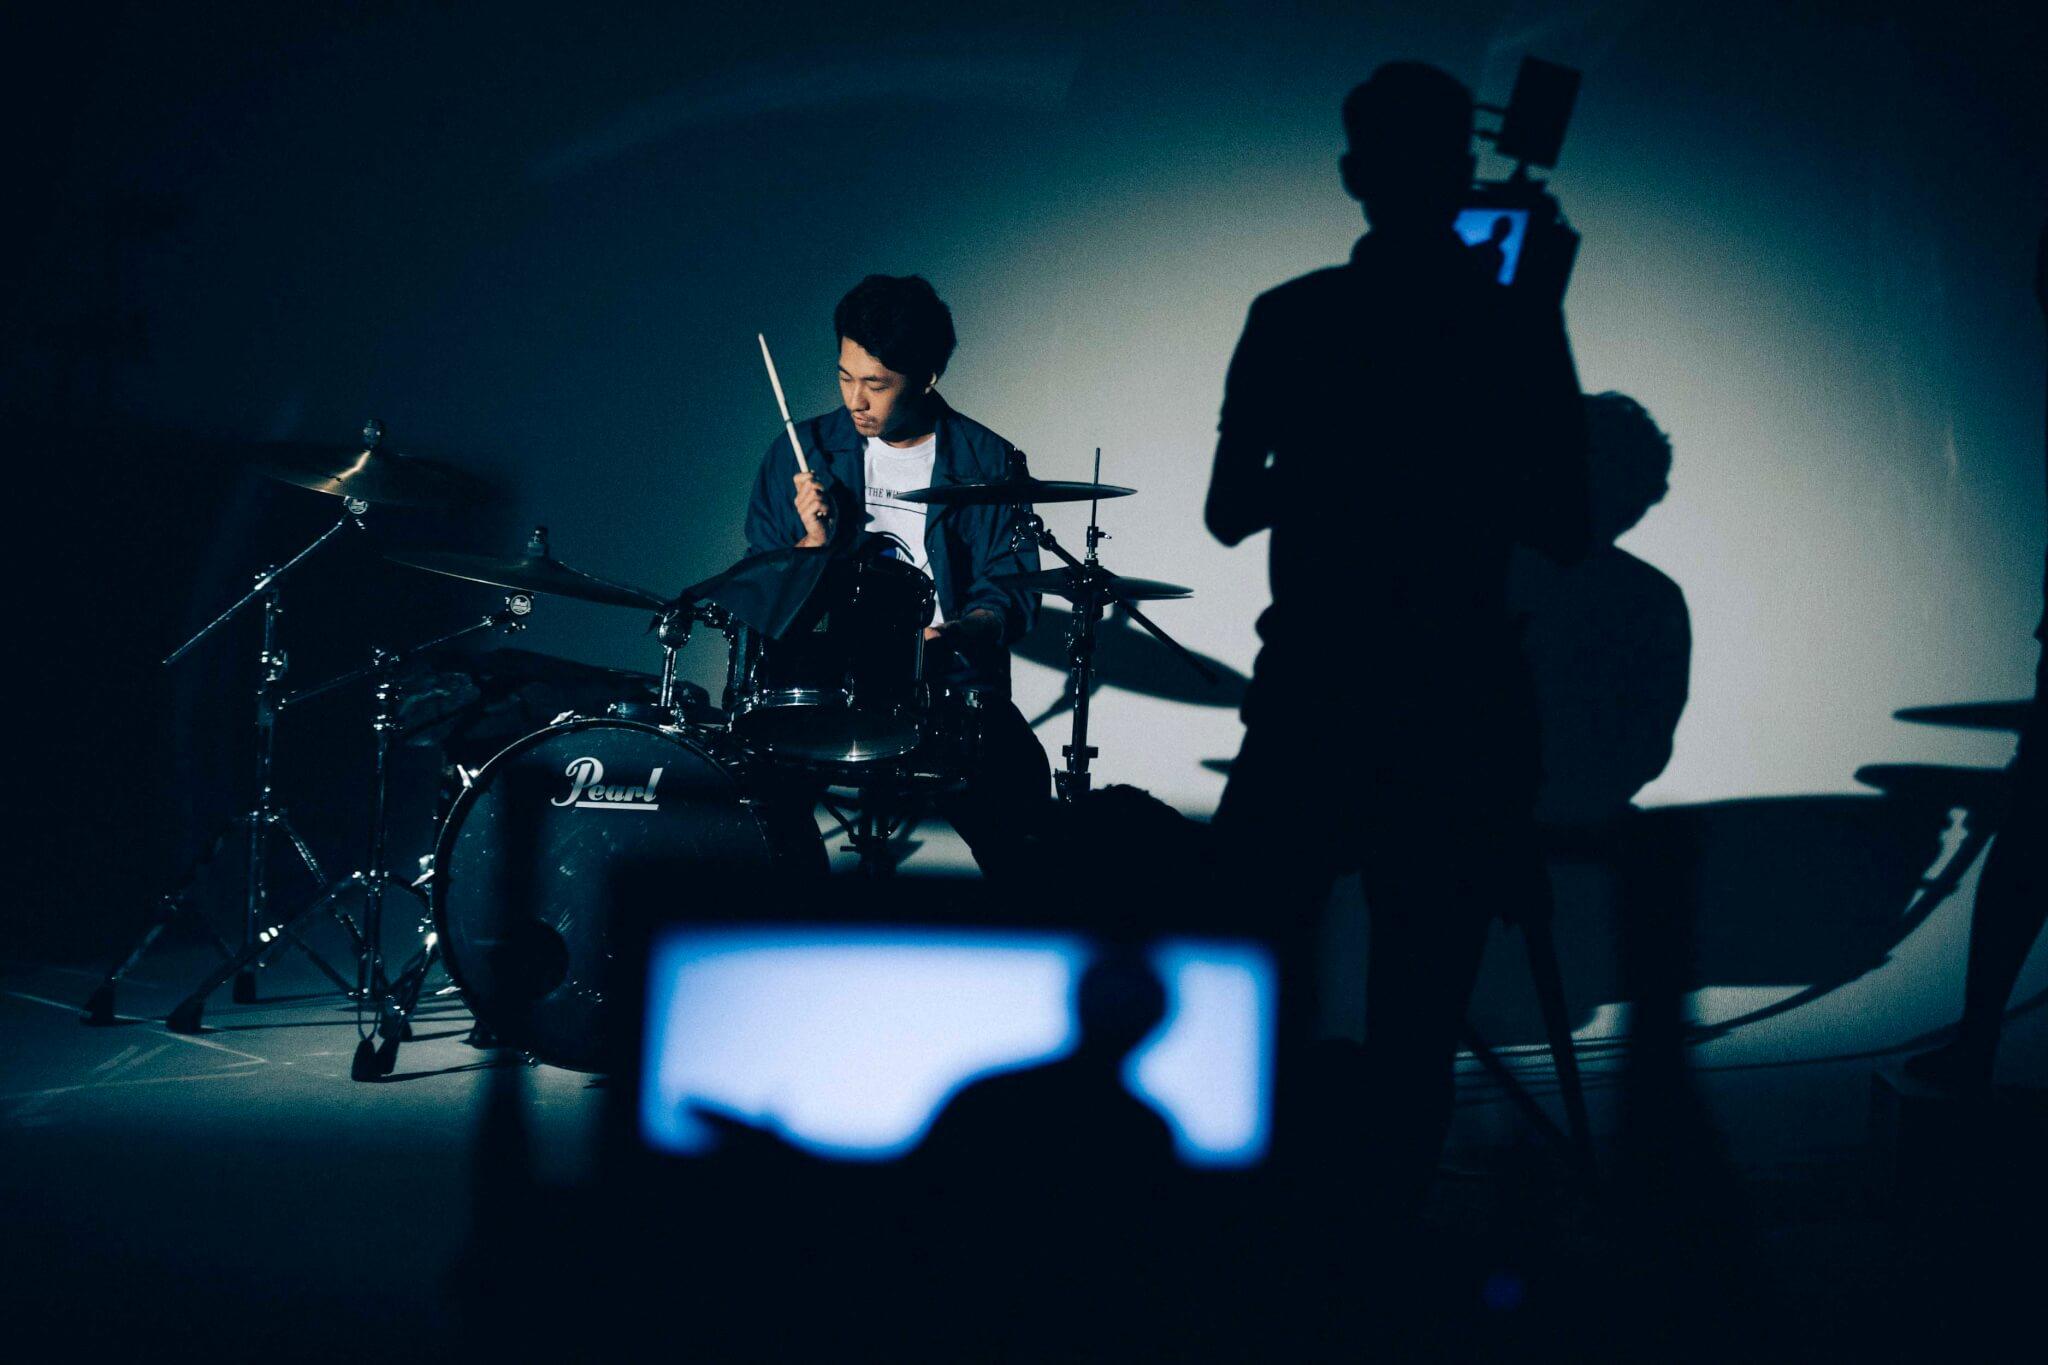 Attractions×ハーレー|コラボ曲「Instant Jam」のMV撮影現場レポ Y1_2377